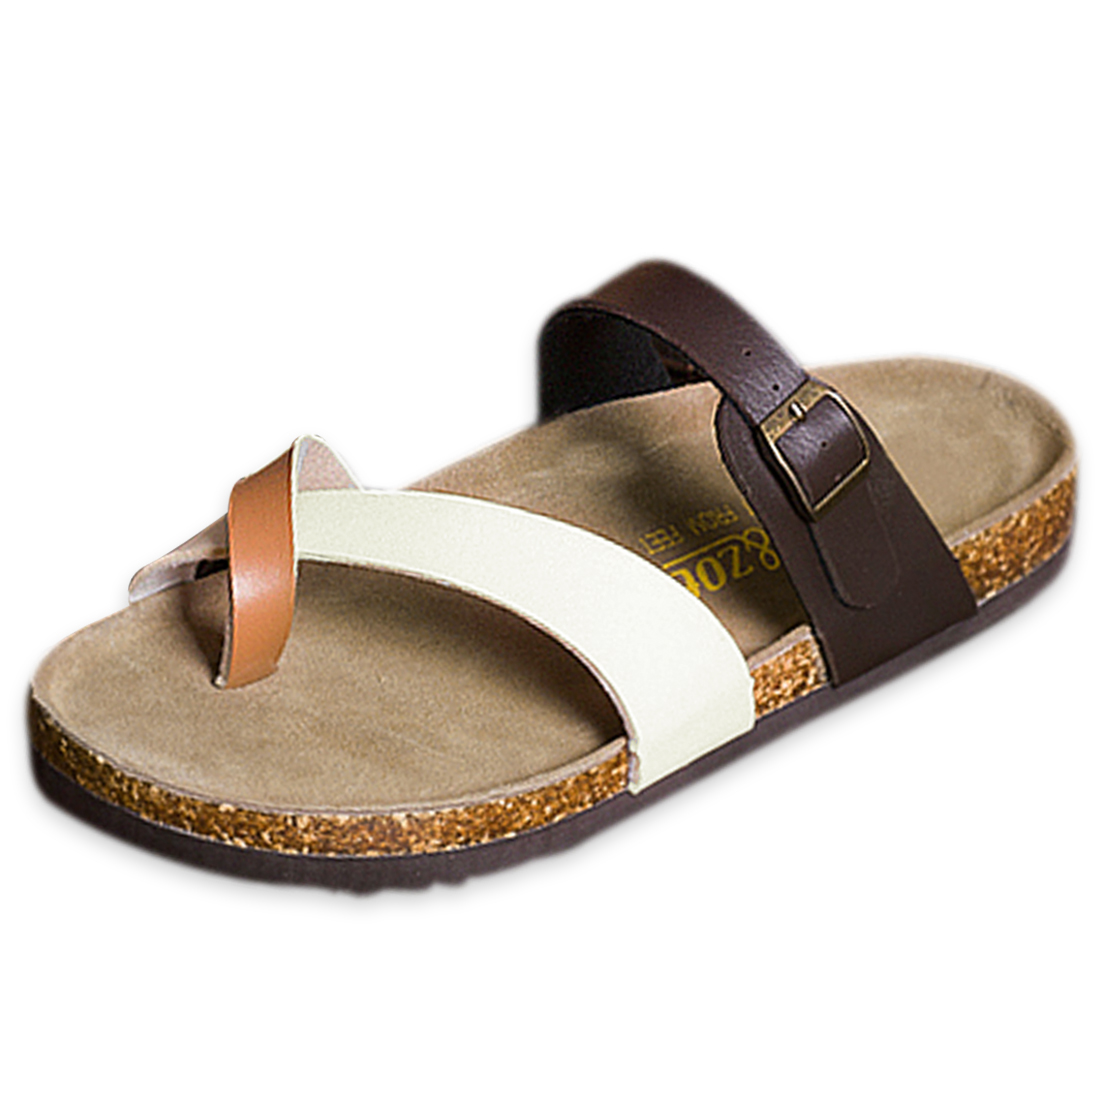 Men Flexible Strap Toe Loop Style Durable Sole Sandal Coffee US Size 8